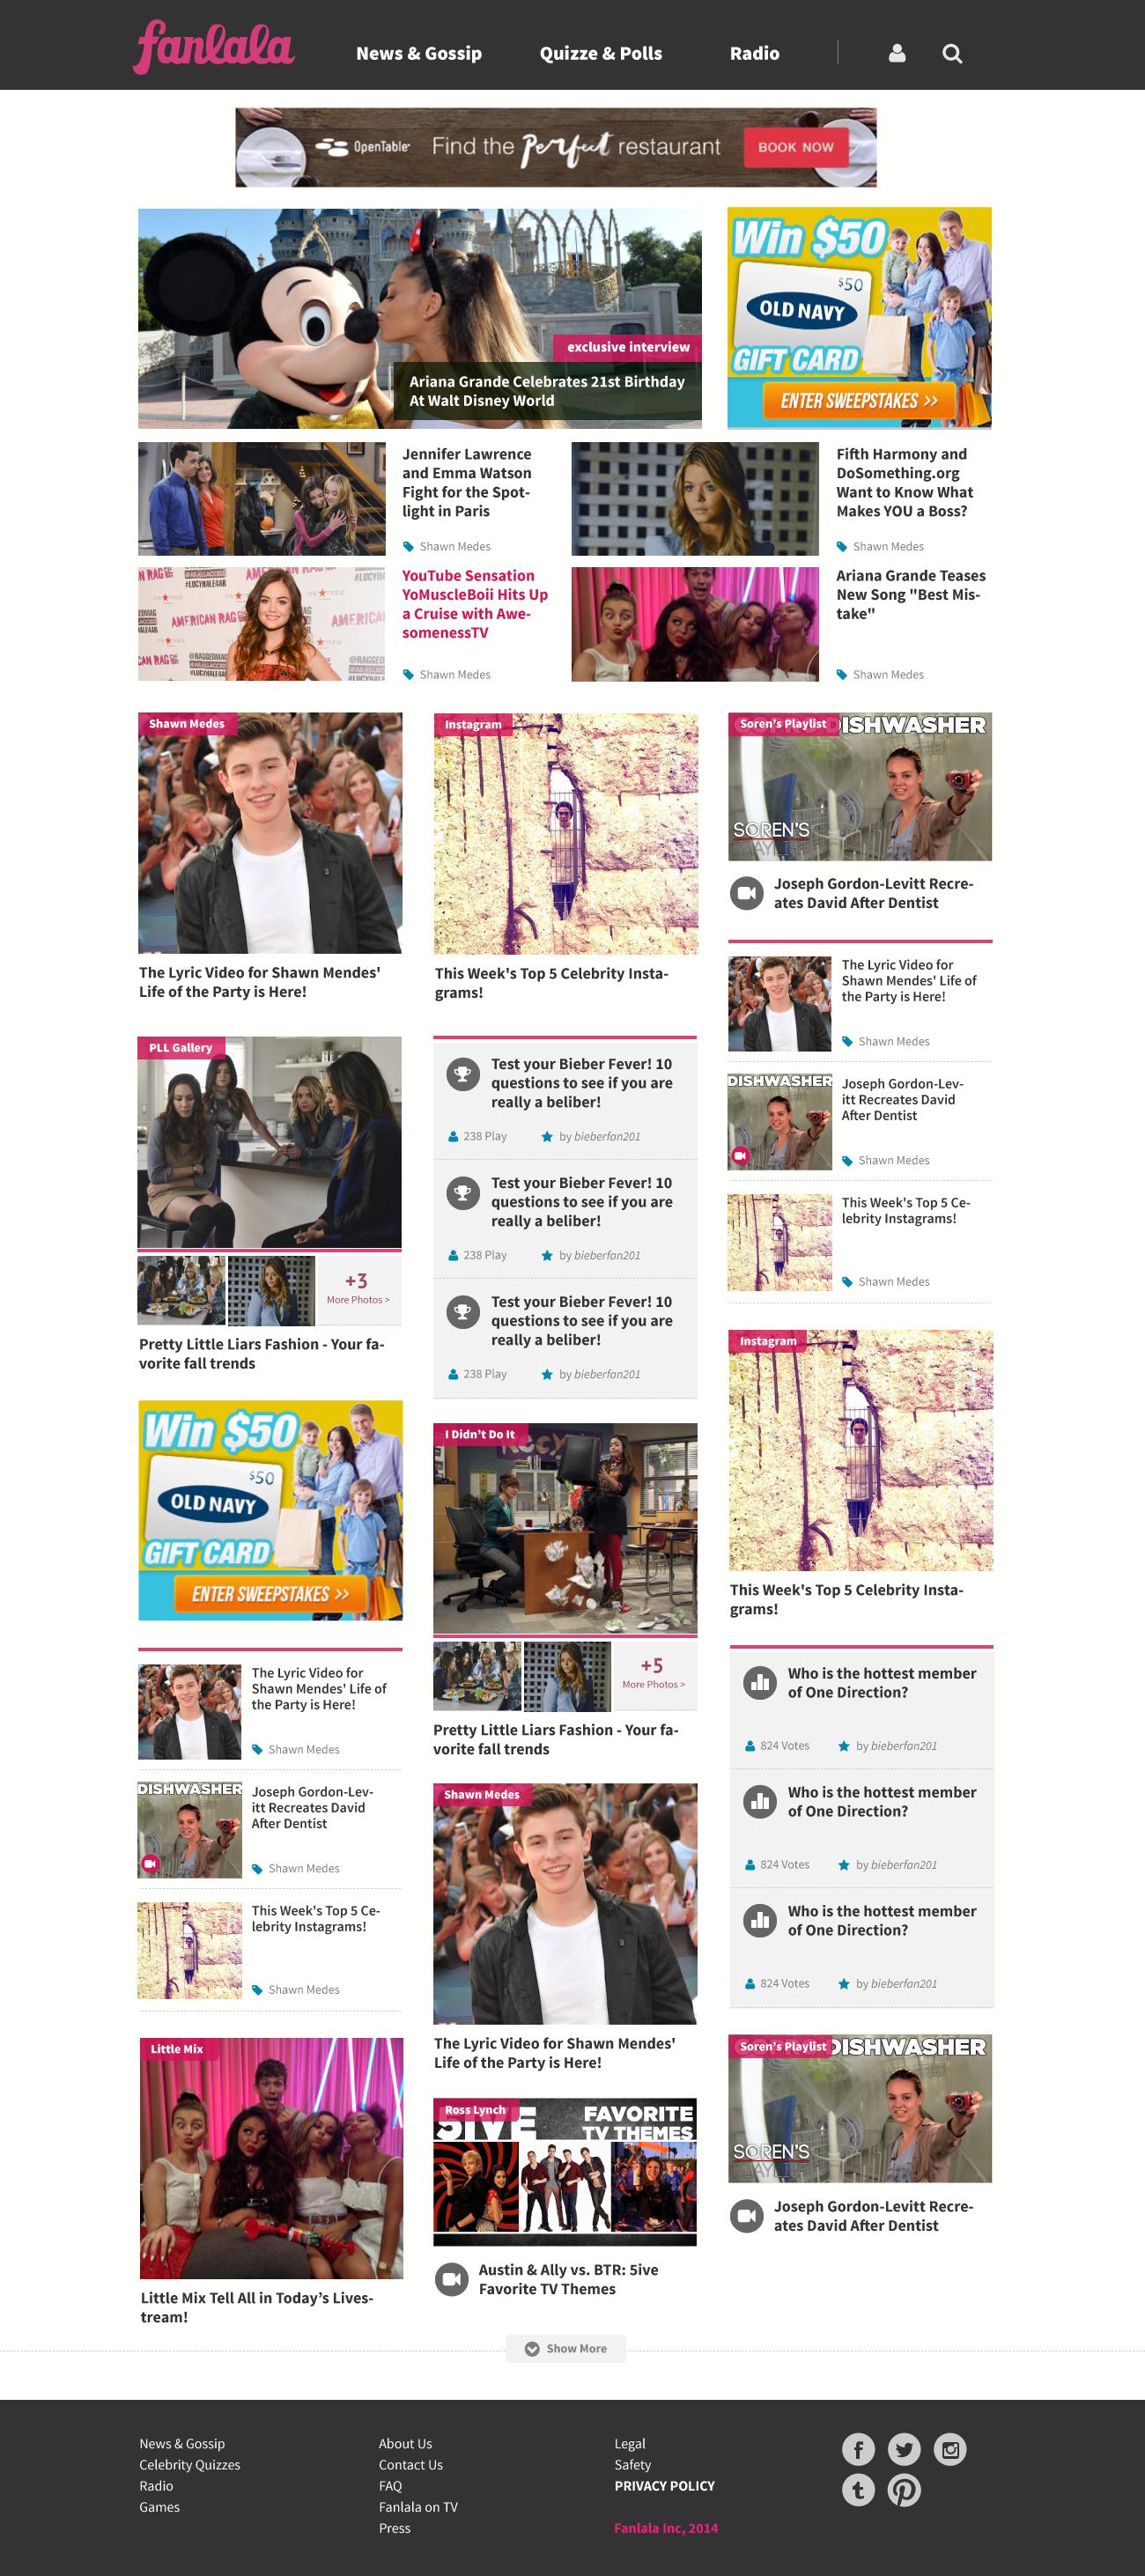 Fanlala-New-Homepage.jpg